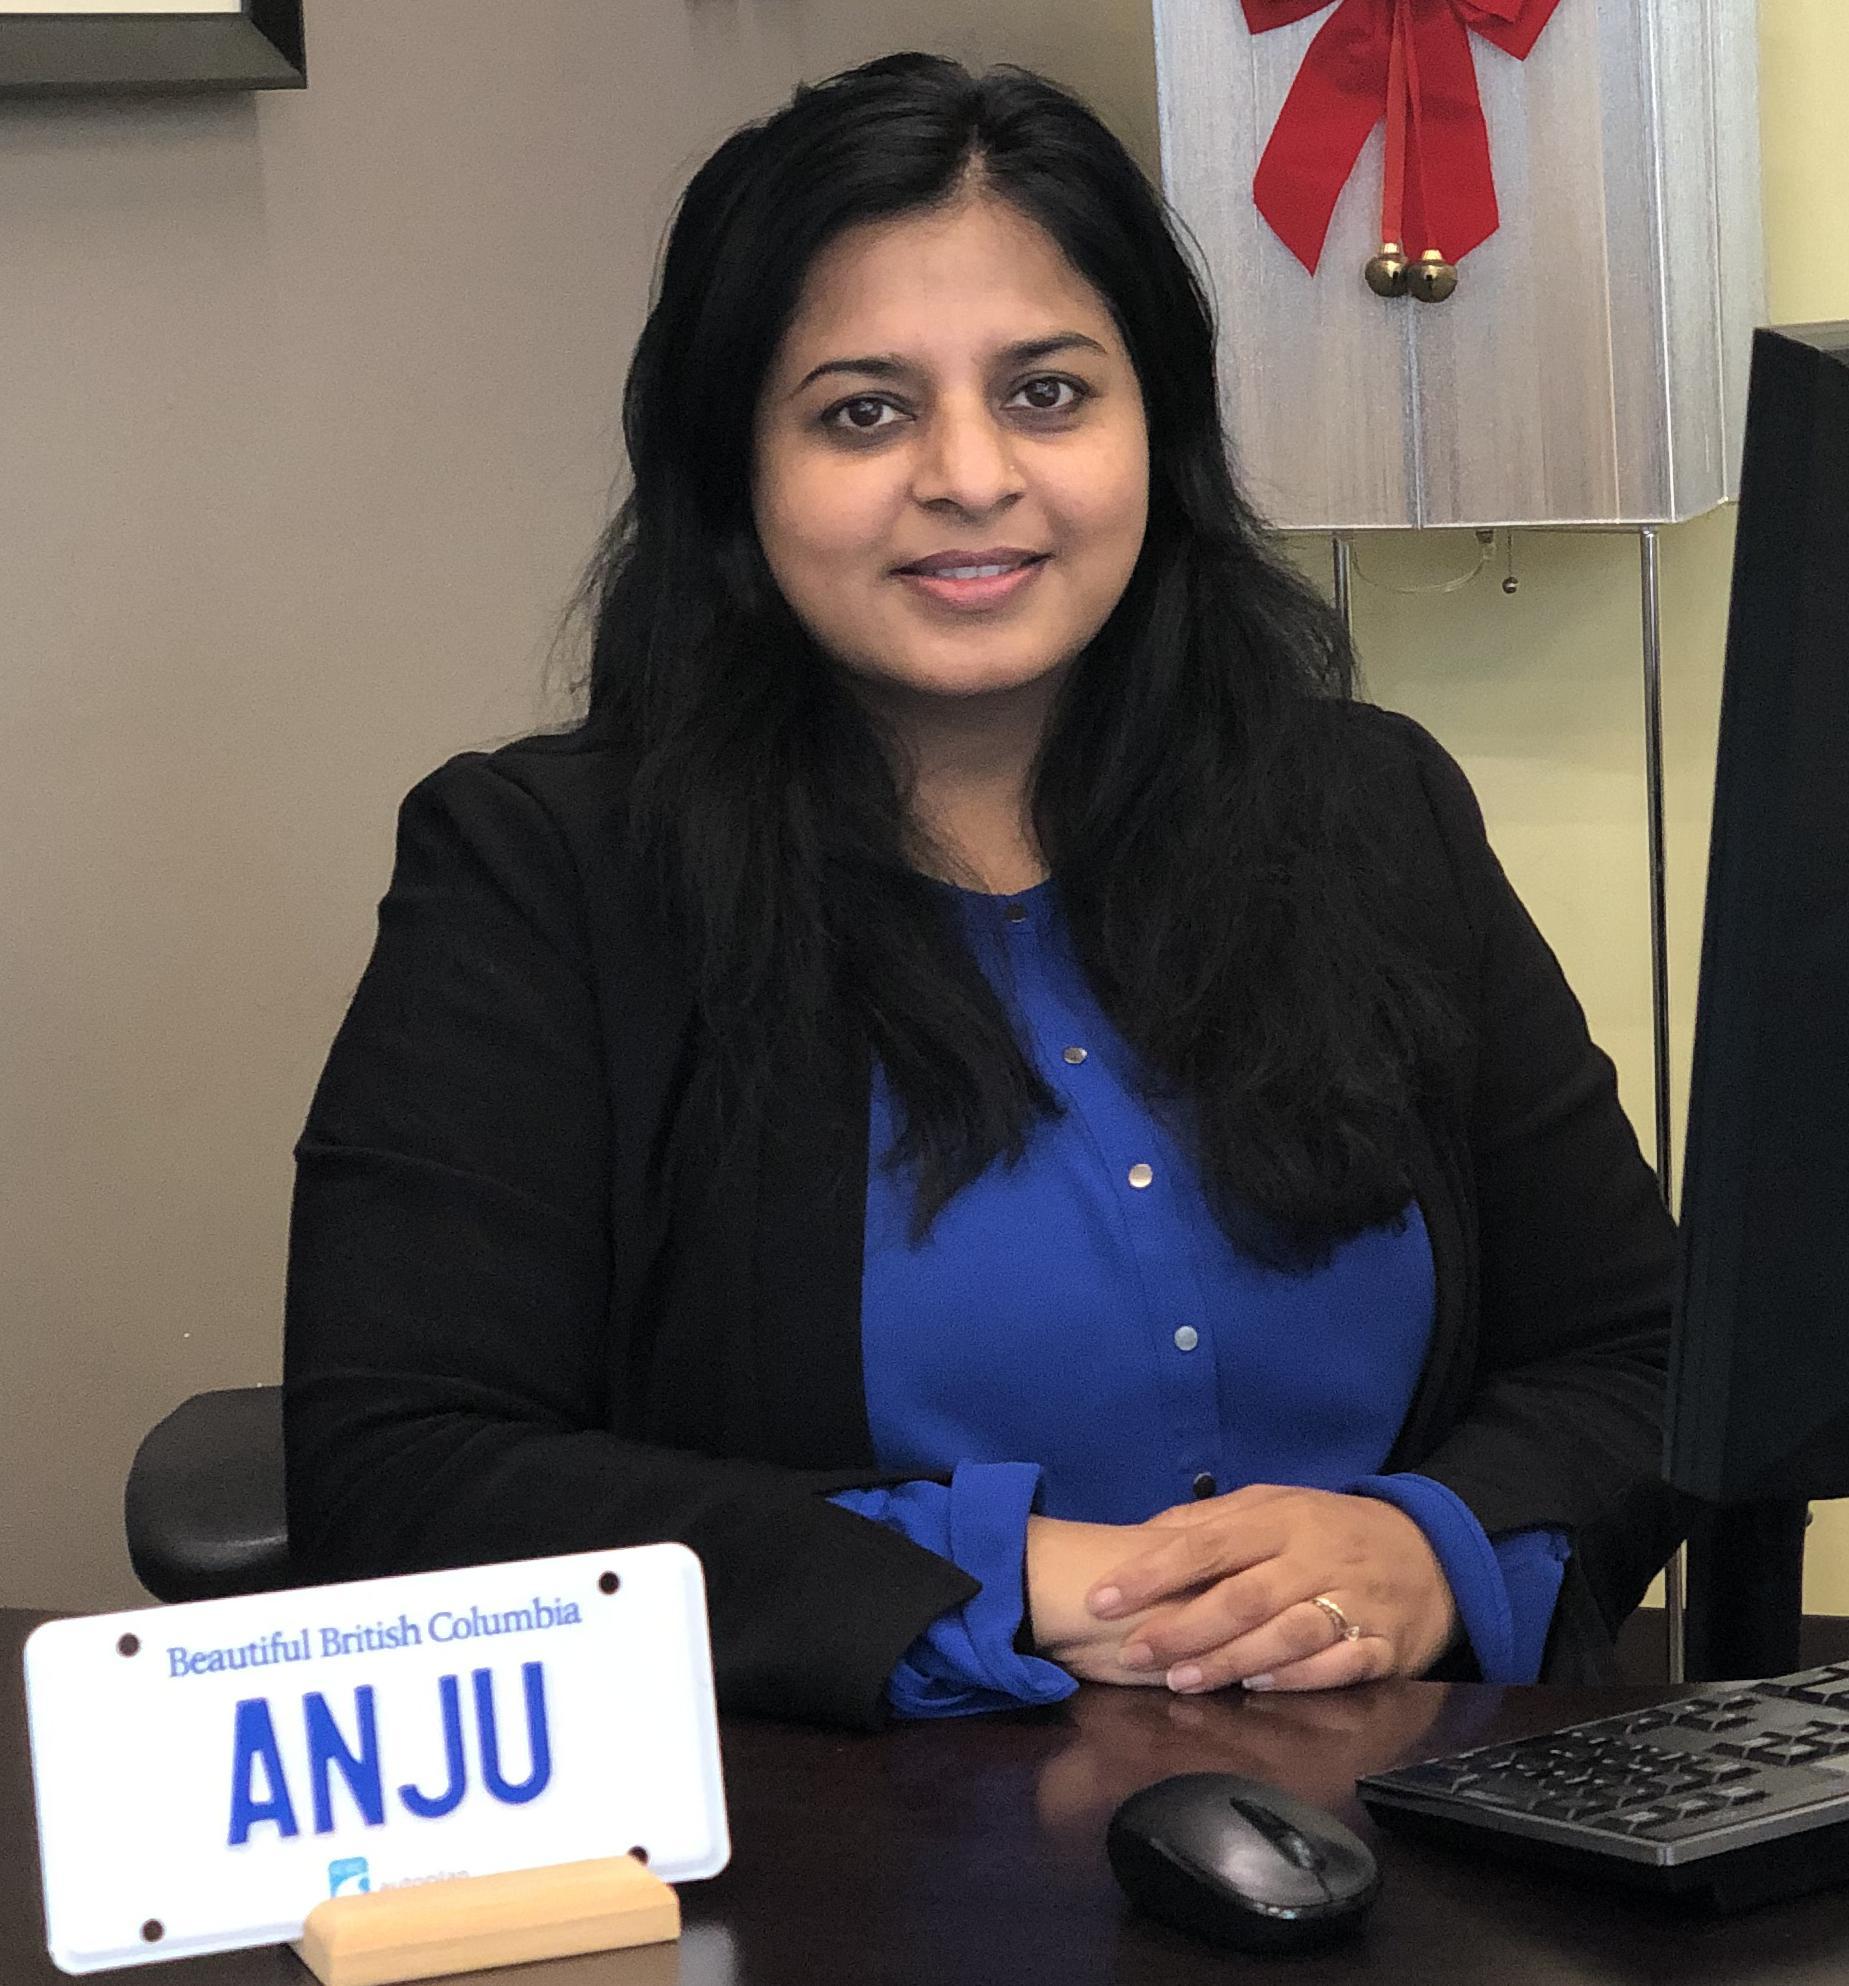 Anju Kiran